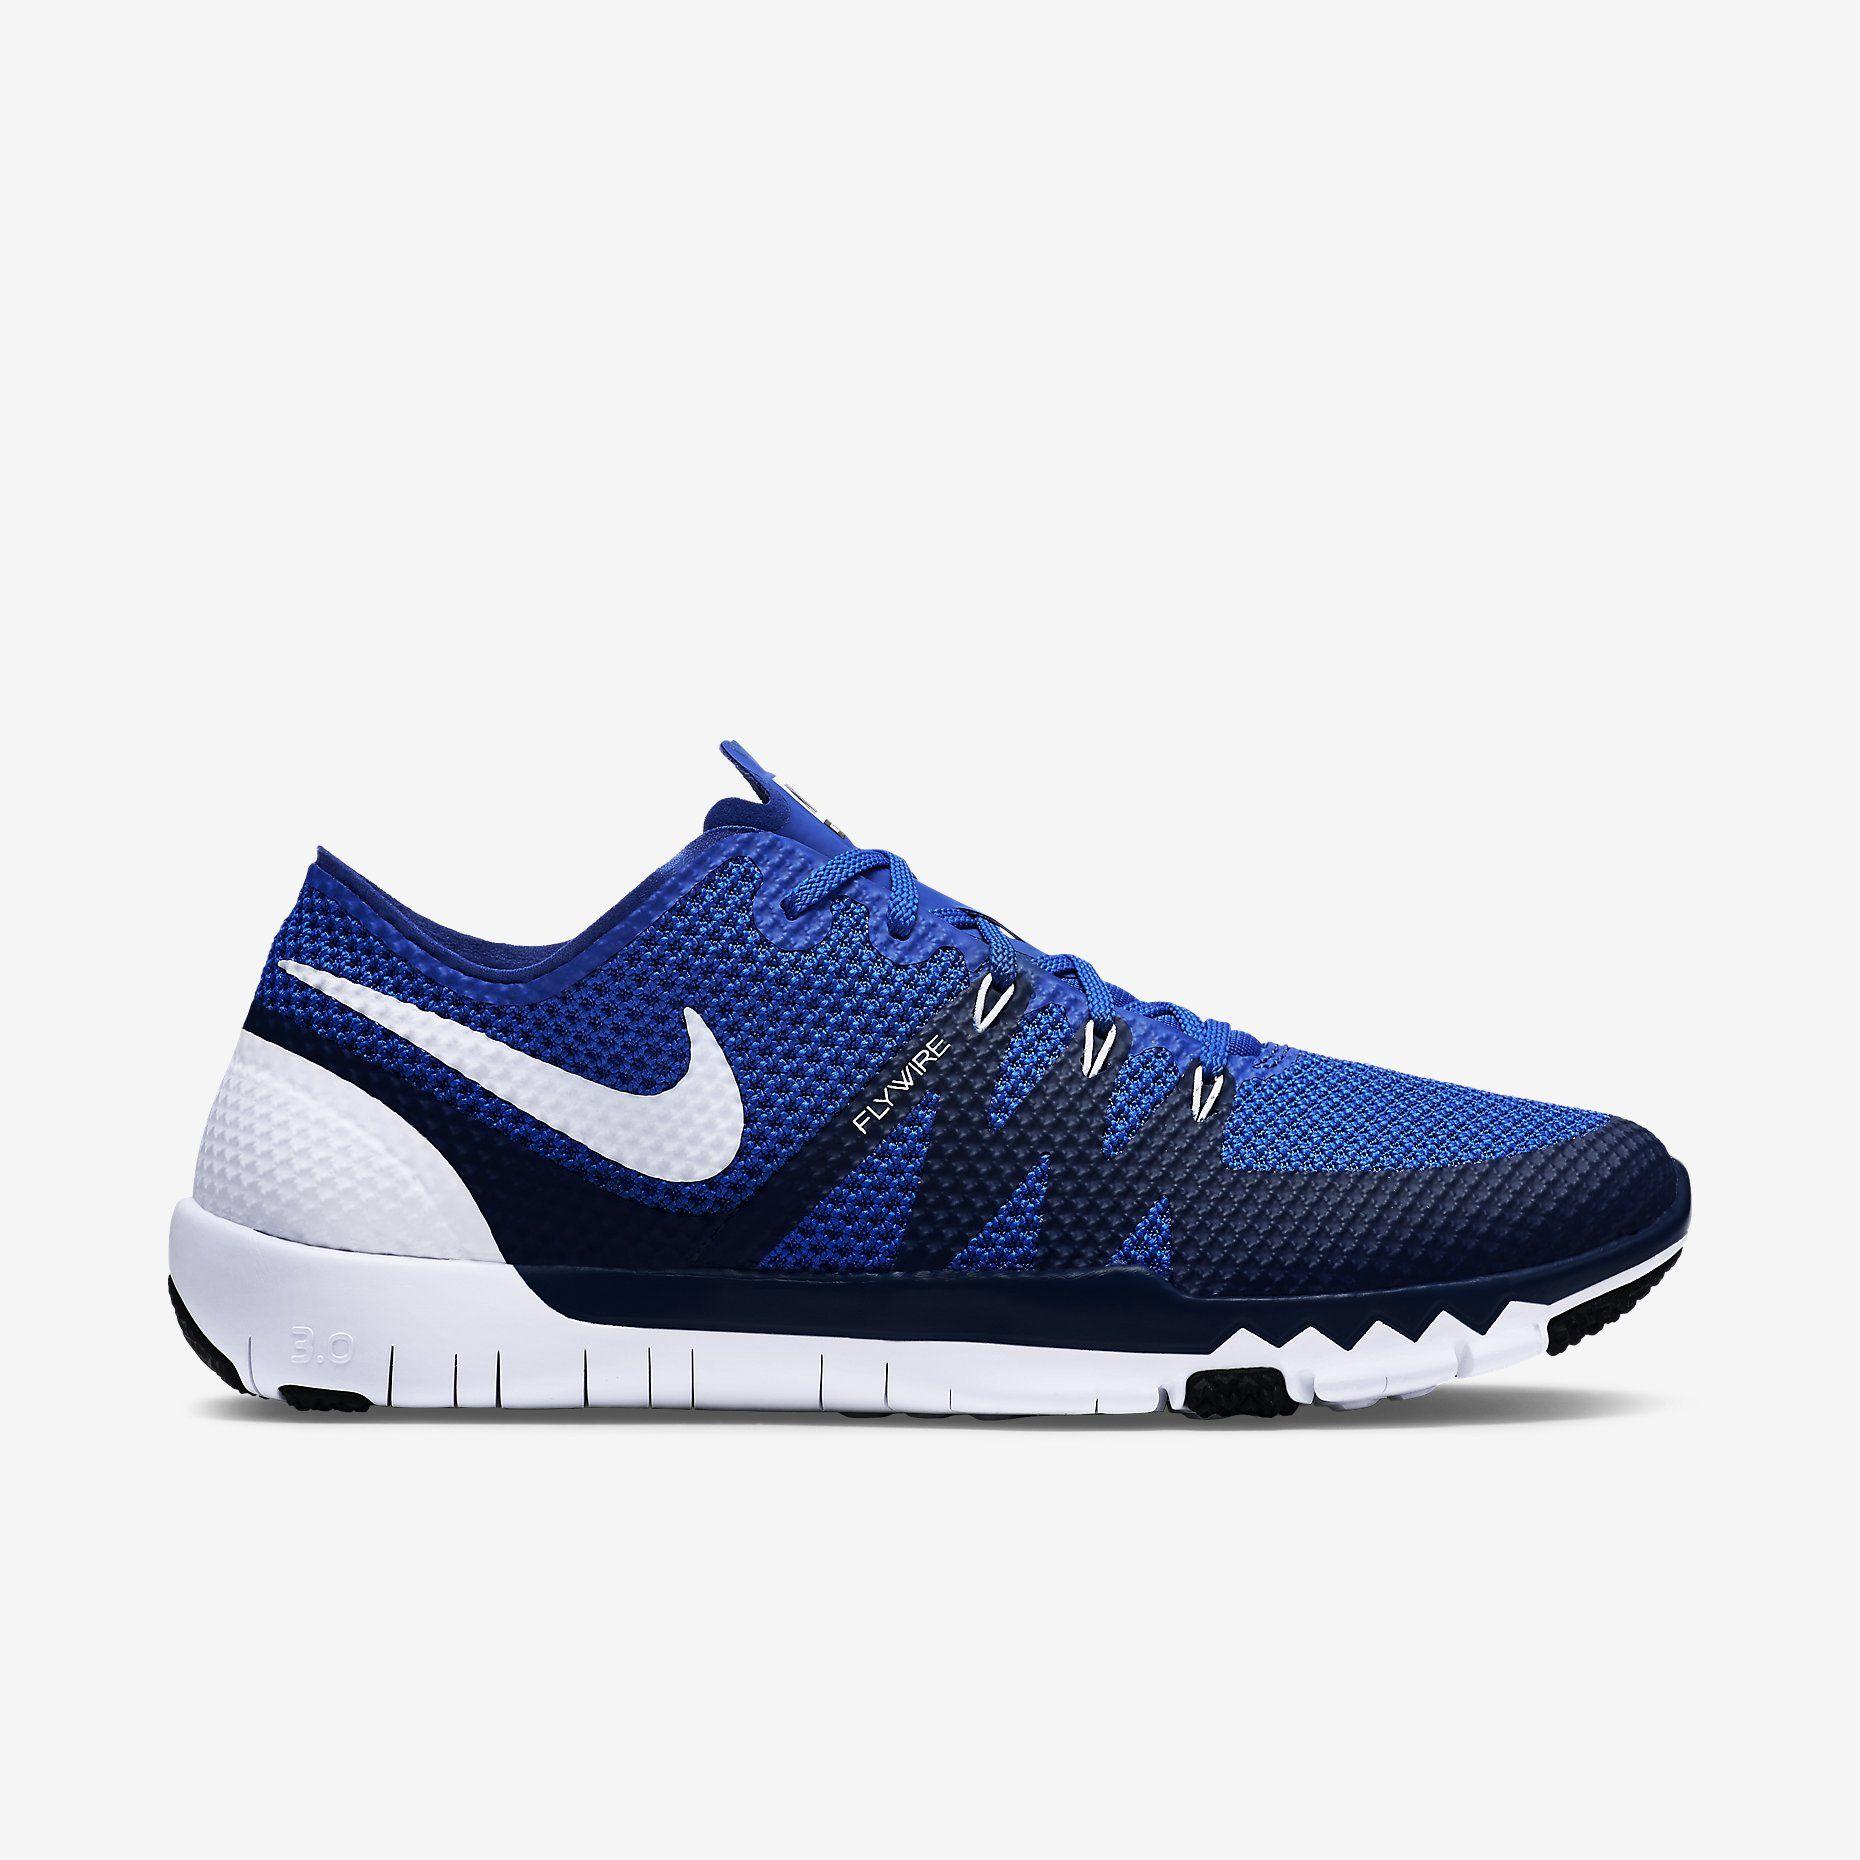 timeless design 28795 a4f16 ... greece nike free trainer 3.0 v3 mens training shoe. 918dc 4b827